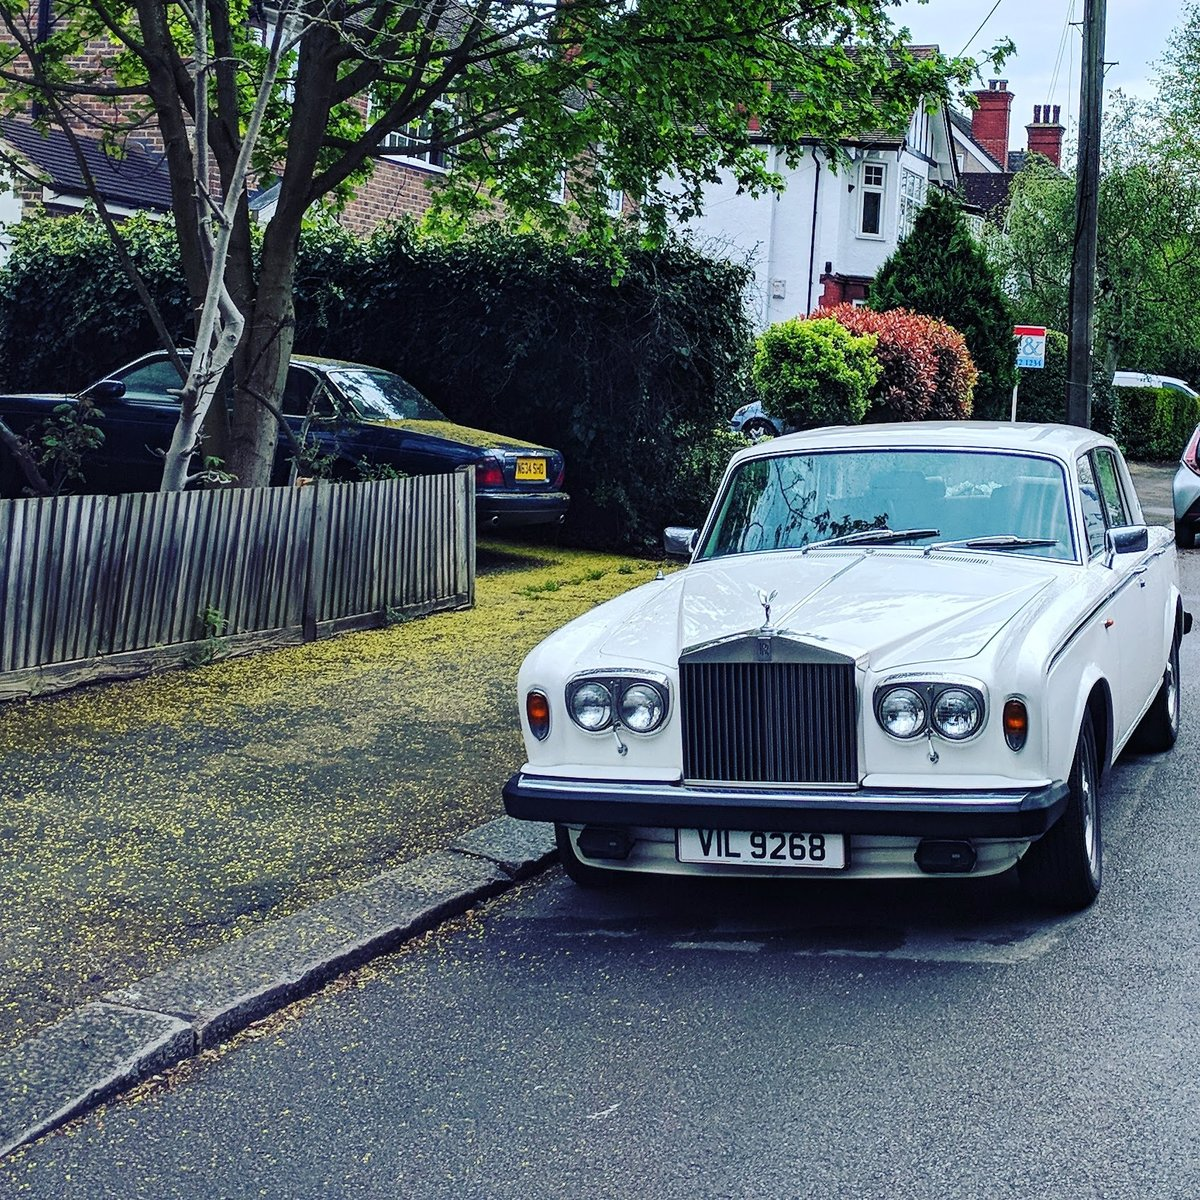 1979 Rolls Royce Silver Shadow II - Australian Edition For Sale (picture 1 of 6)